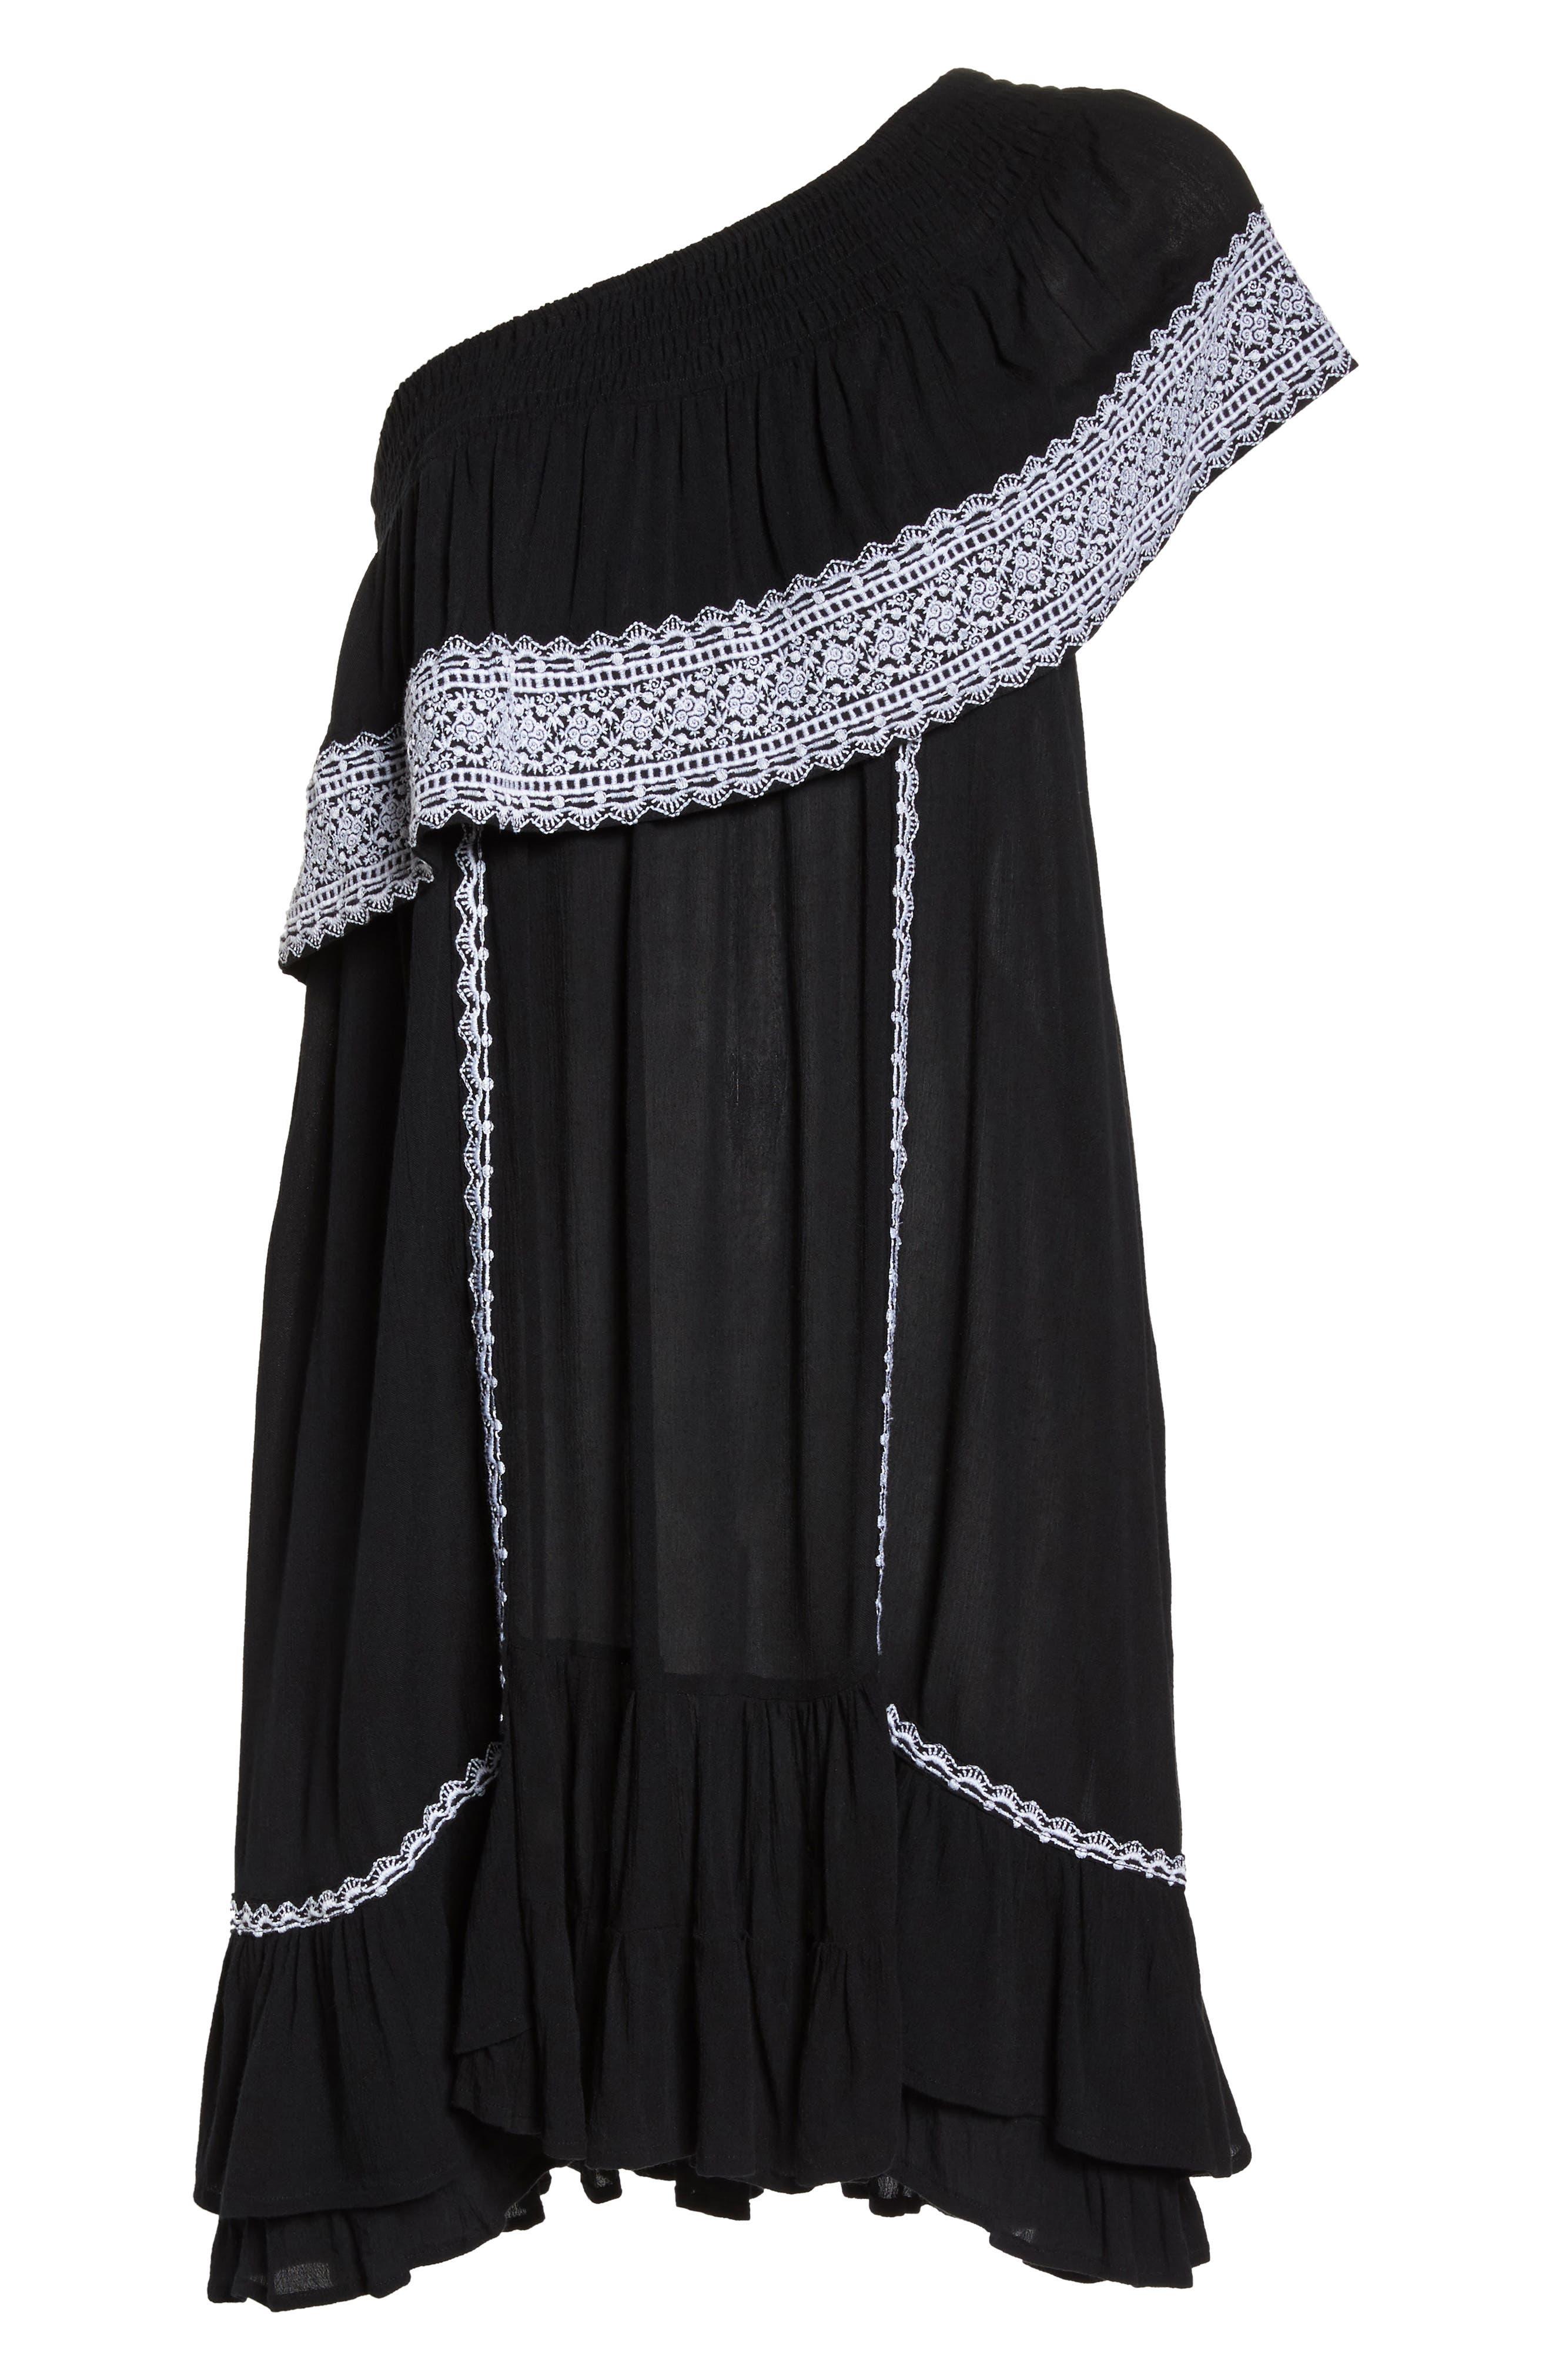 Gavin One-Shoulder Cover-Up Dress,                             Alternate thumbnail 6, color,                             002